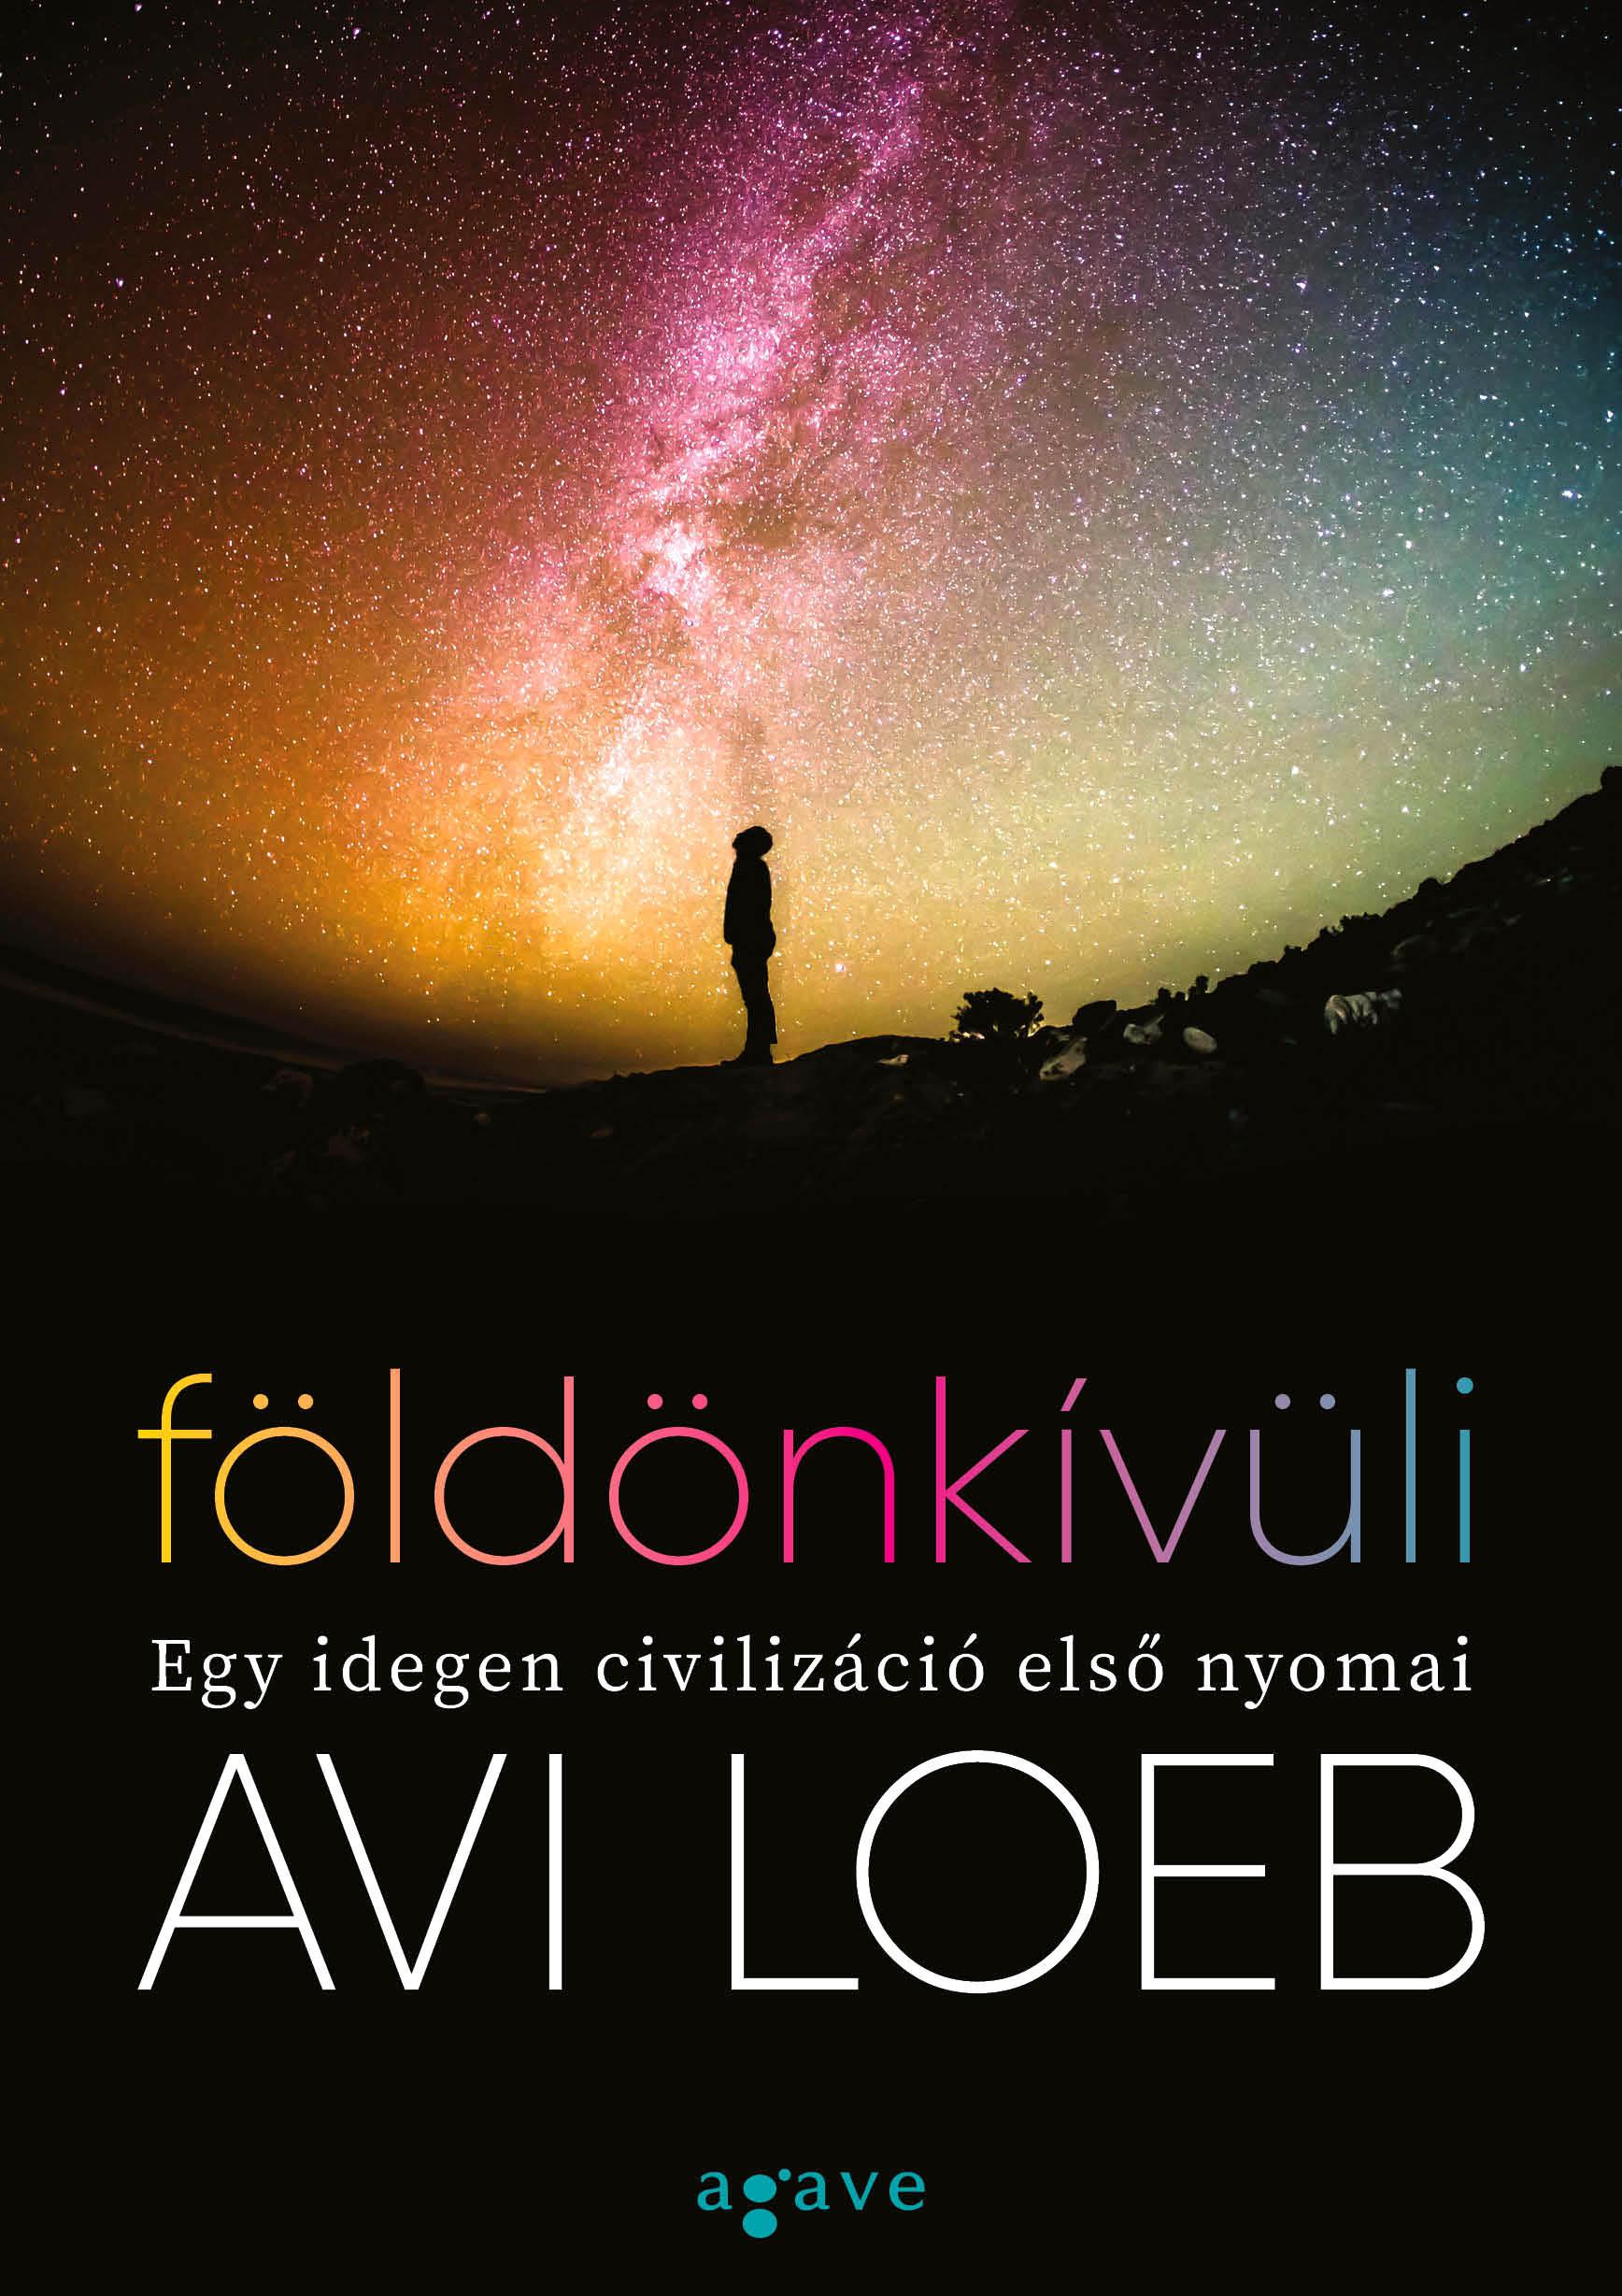 avi_loeb_foldonkivuli_b1.jpg